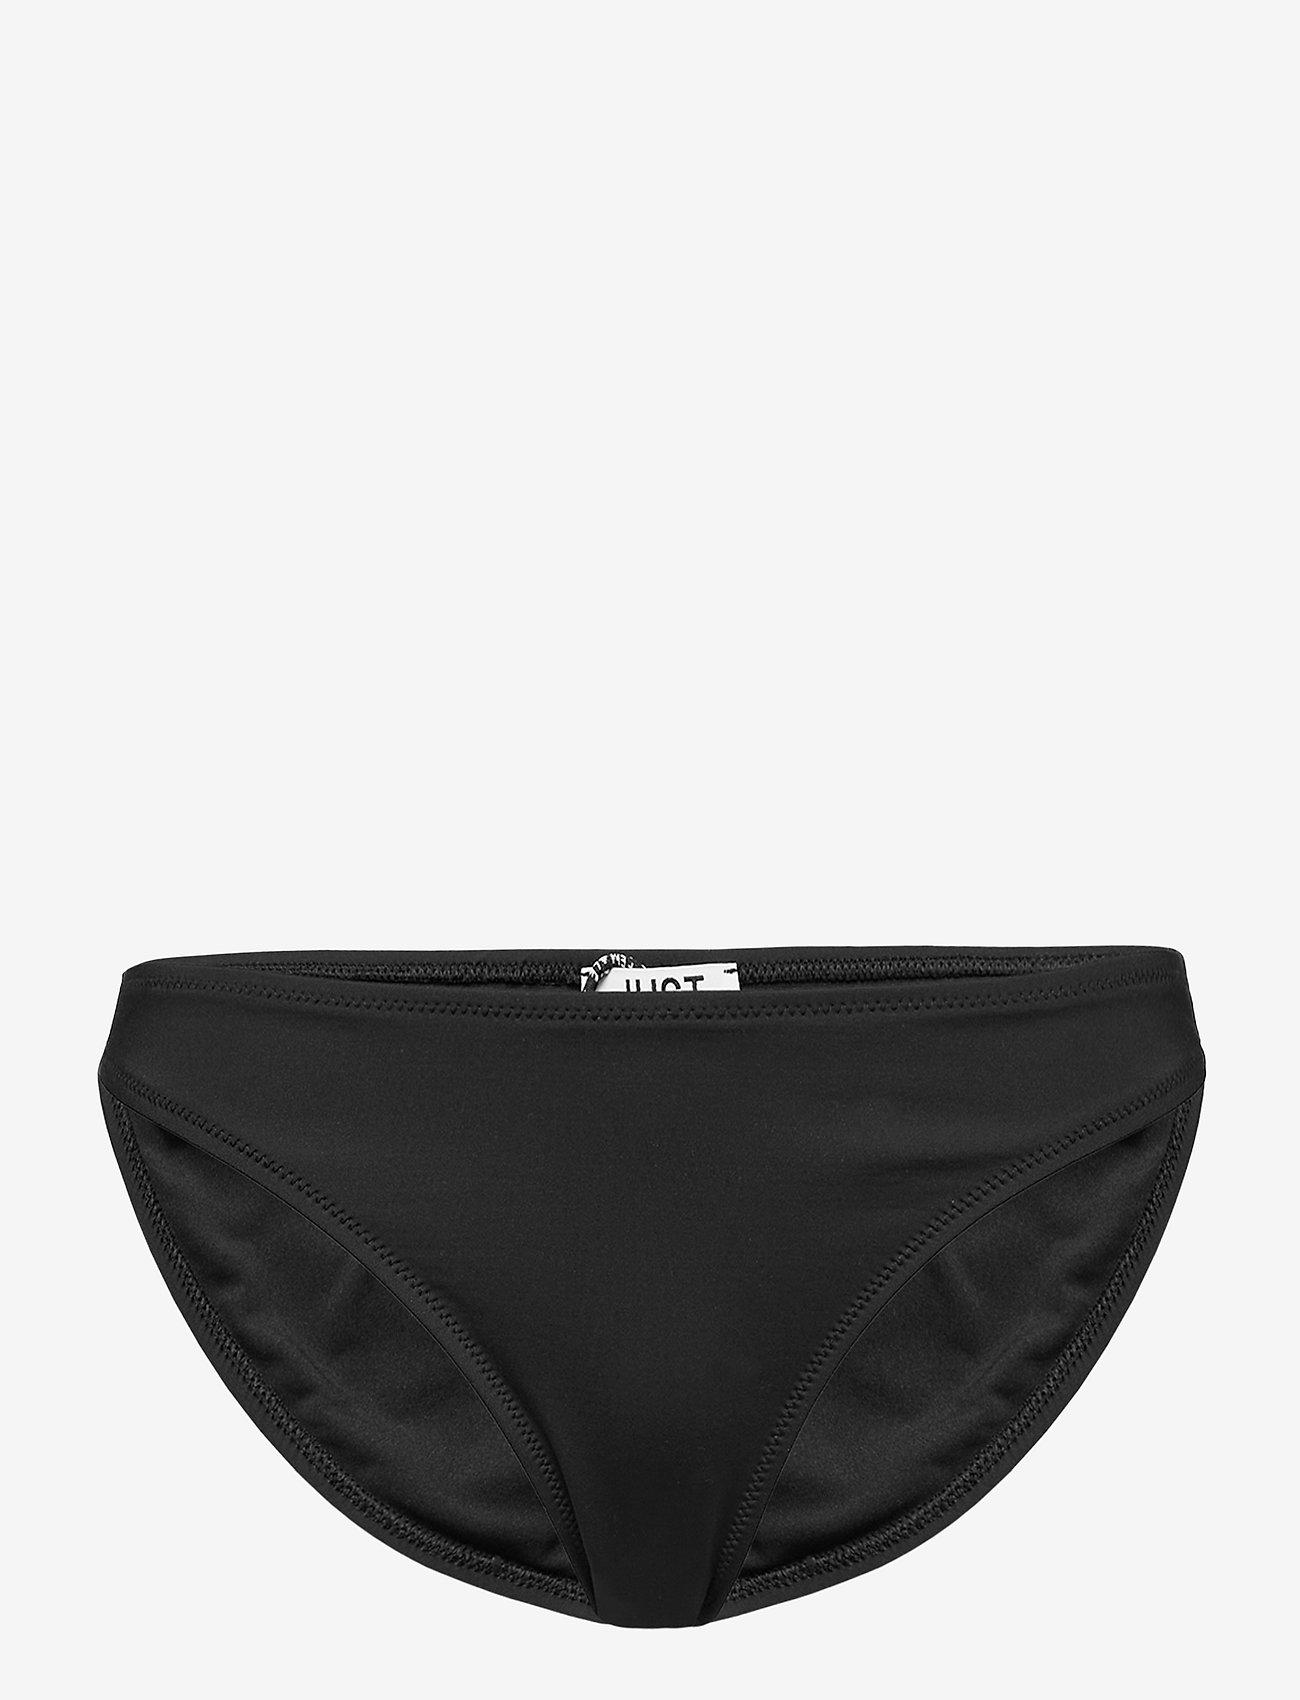 Just Female - Paola bikini bottom - bikini bottoms - black - 1